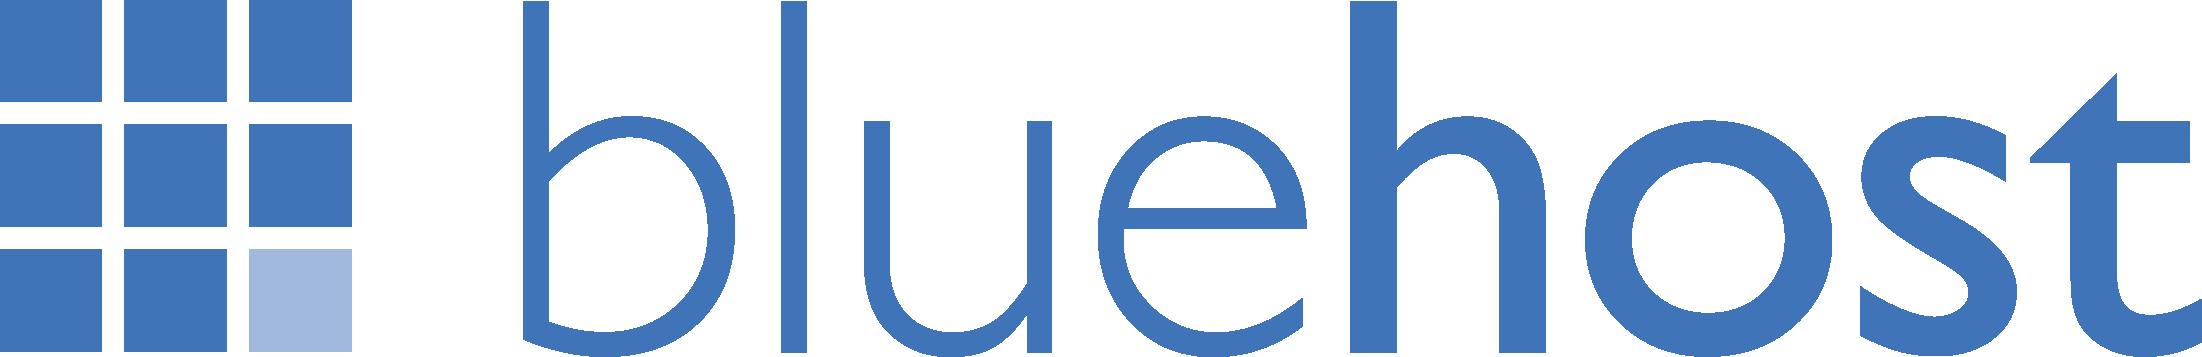 Bluehost Logo Download Vector.